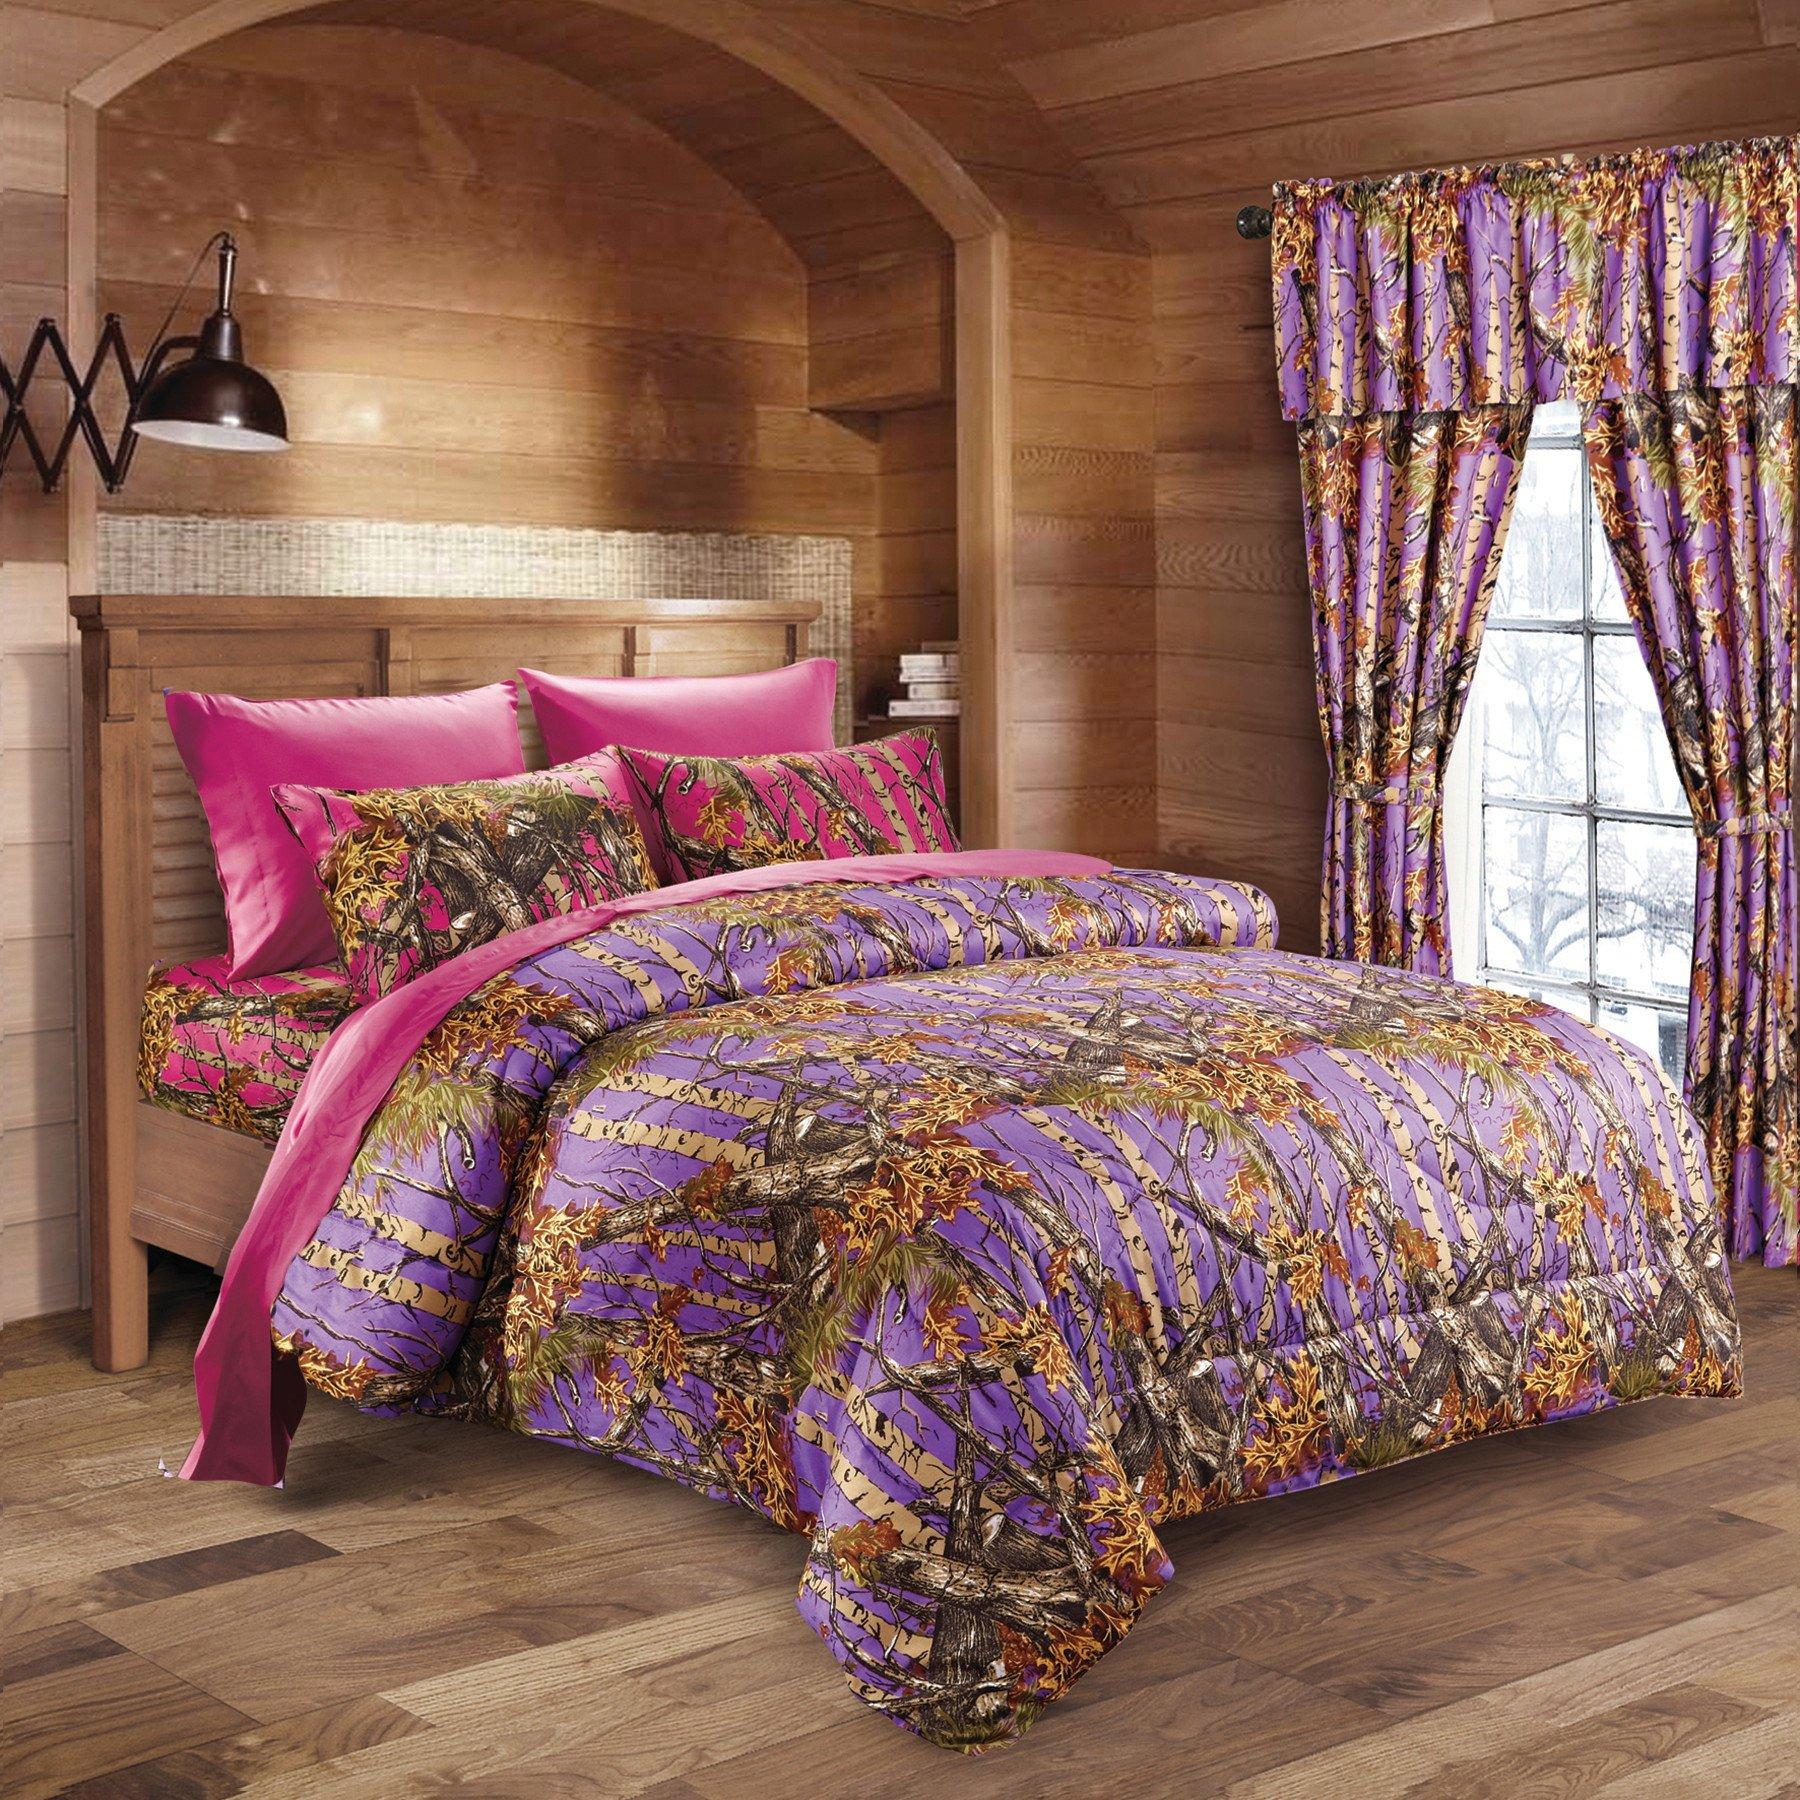 20 Lakes Hunter Camo Comforter, Sheet, Pillowcase Set Purple & Hot Pink (Twin, Purple & Hot Pink)